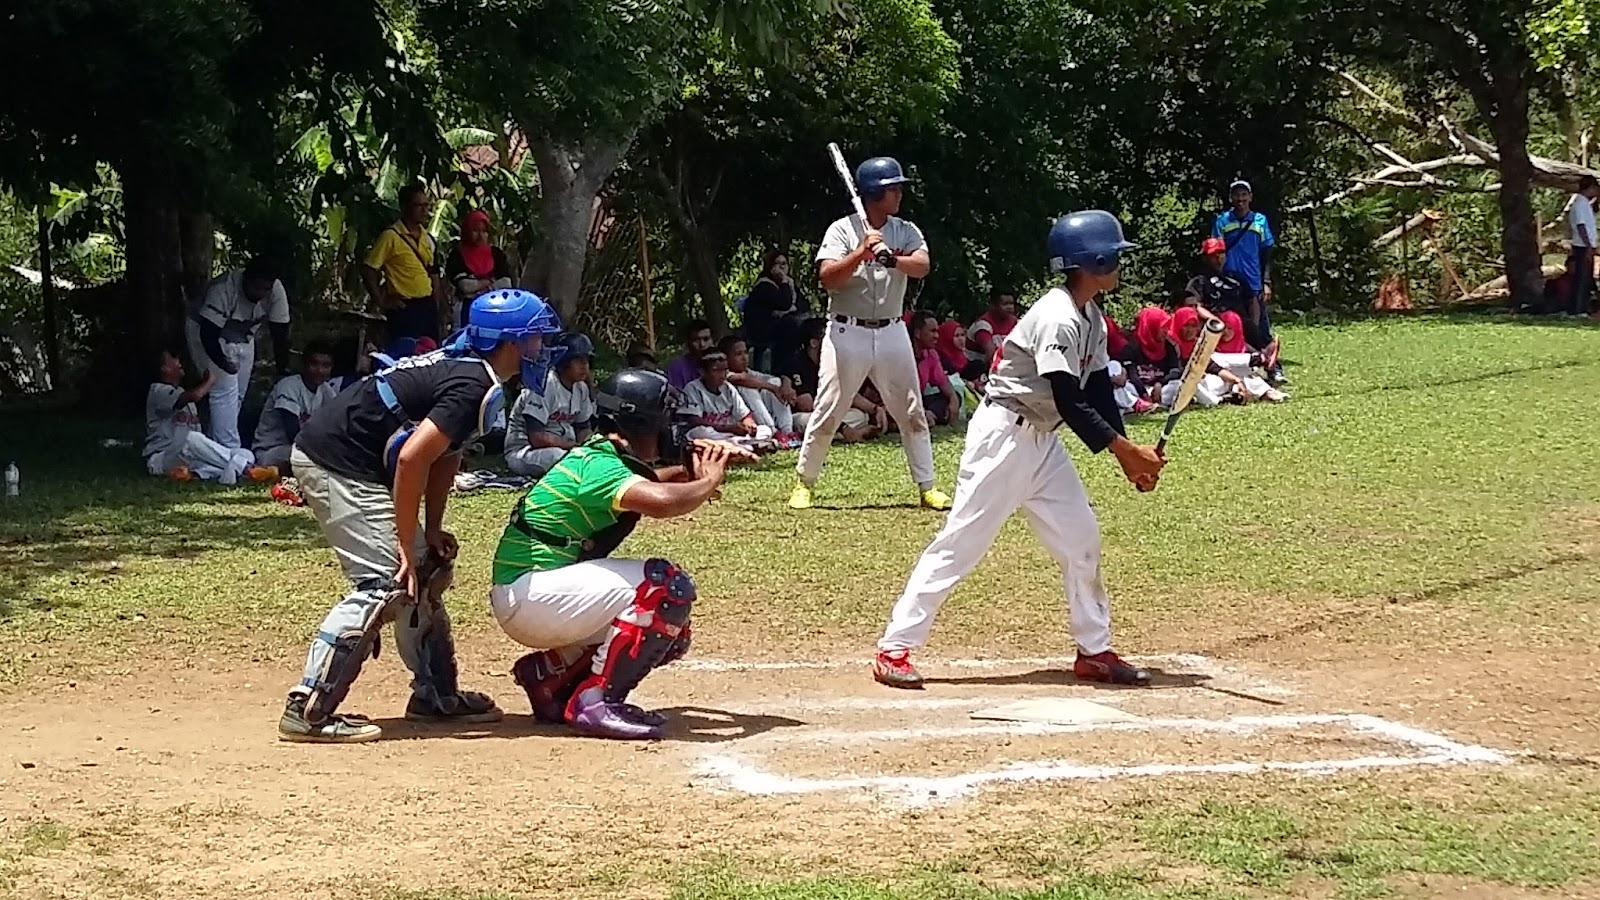 Kejohanan Sofbol MSSD Kubang Pasu 2015 - SMK Jerlun vs SMK Pulau Nyior